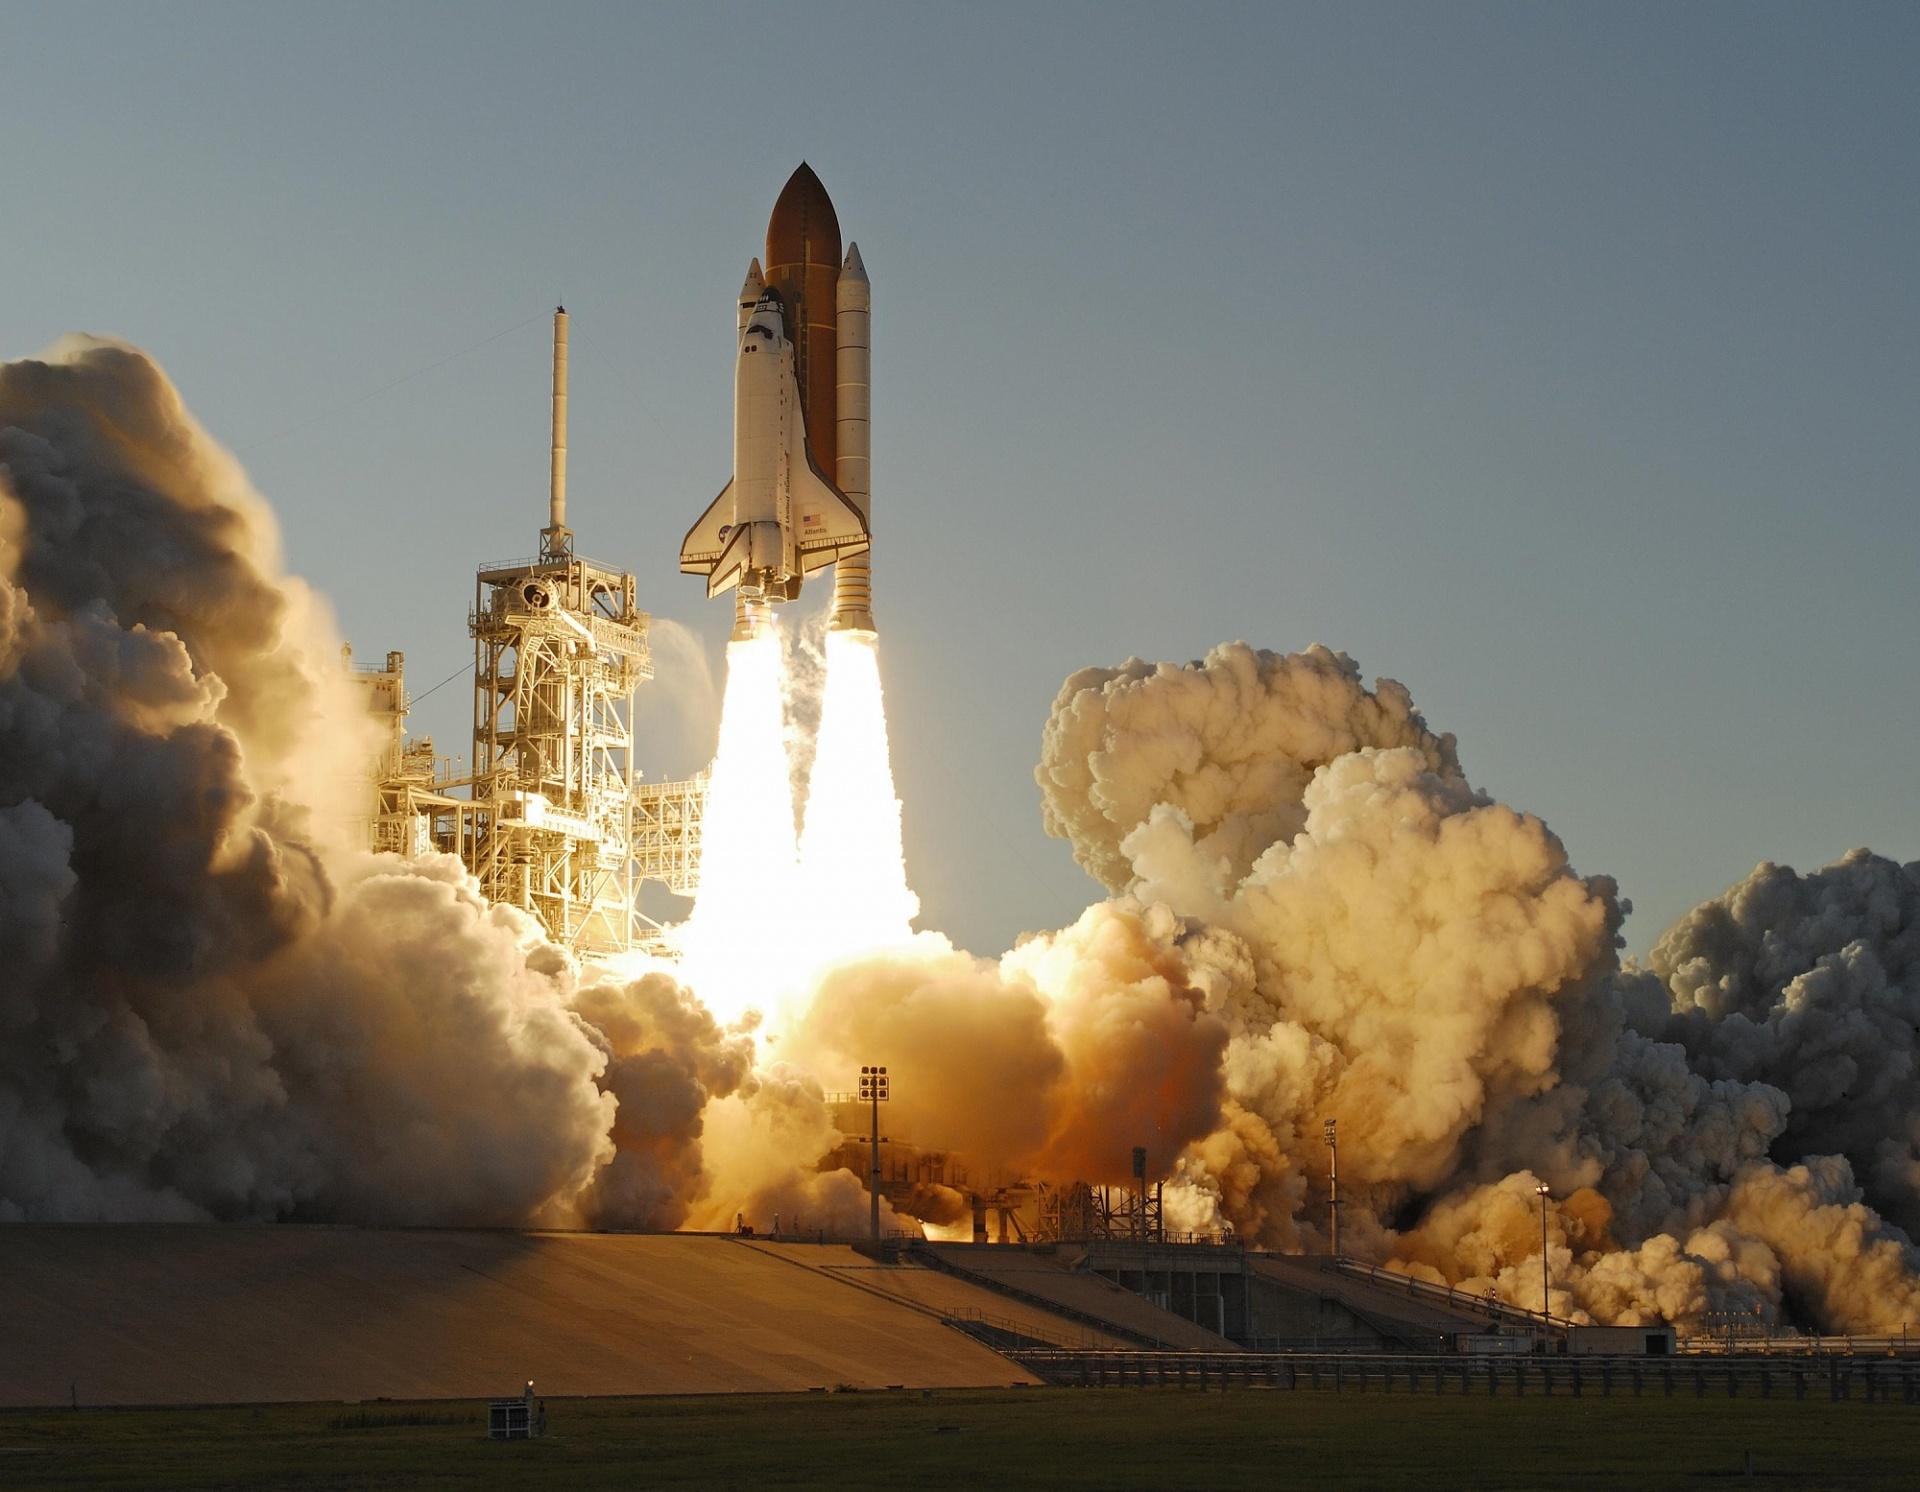 Space Shuttle Launch Free Stock Photo - Public Domain Pictures